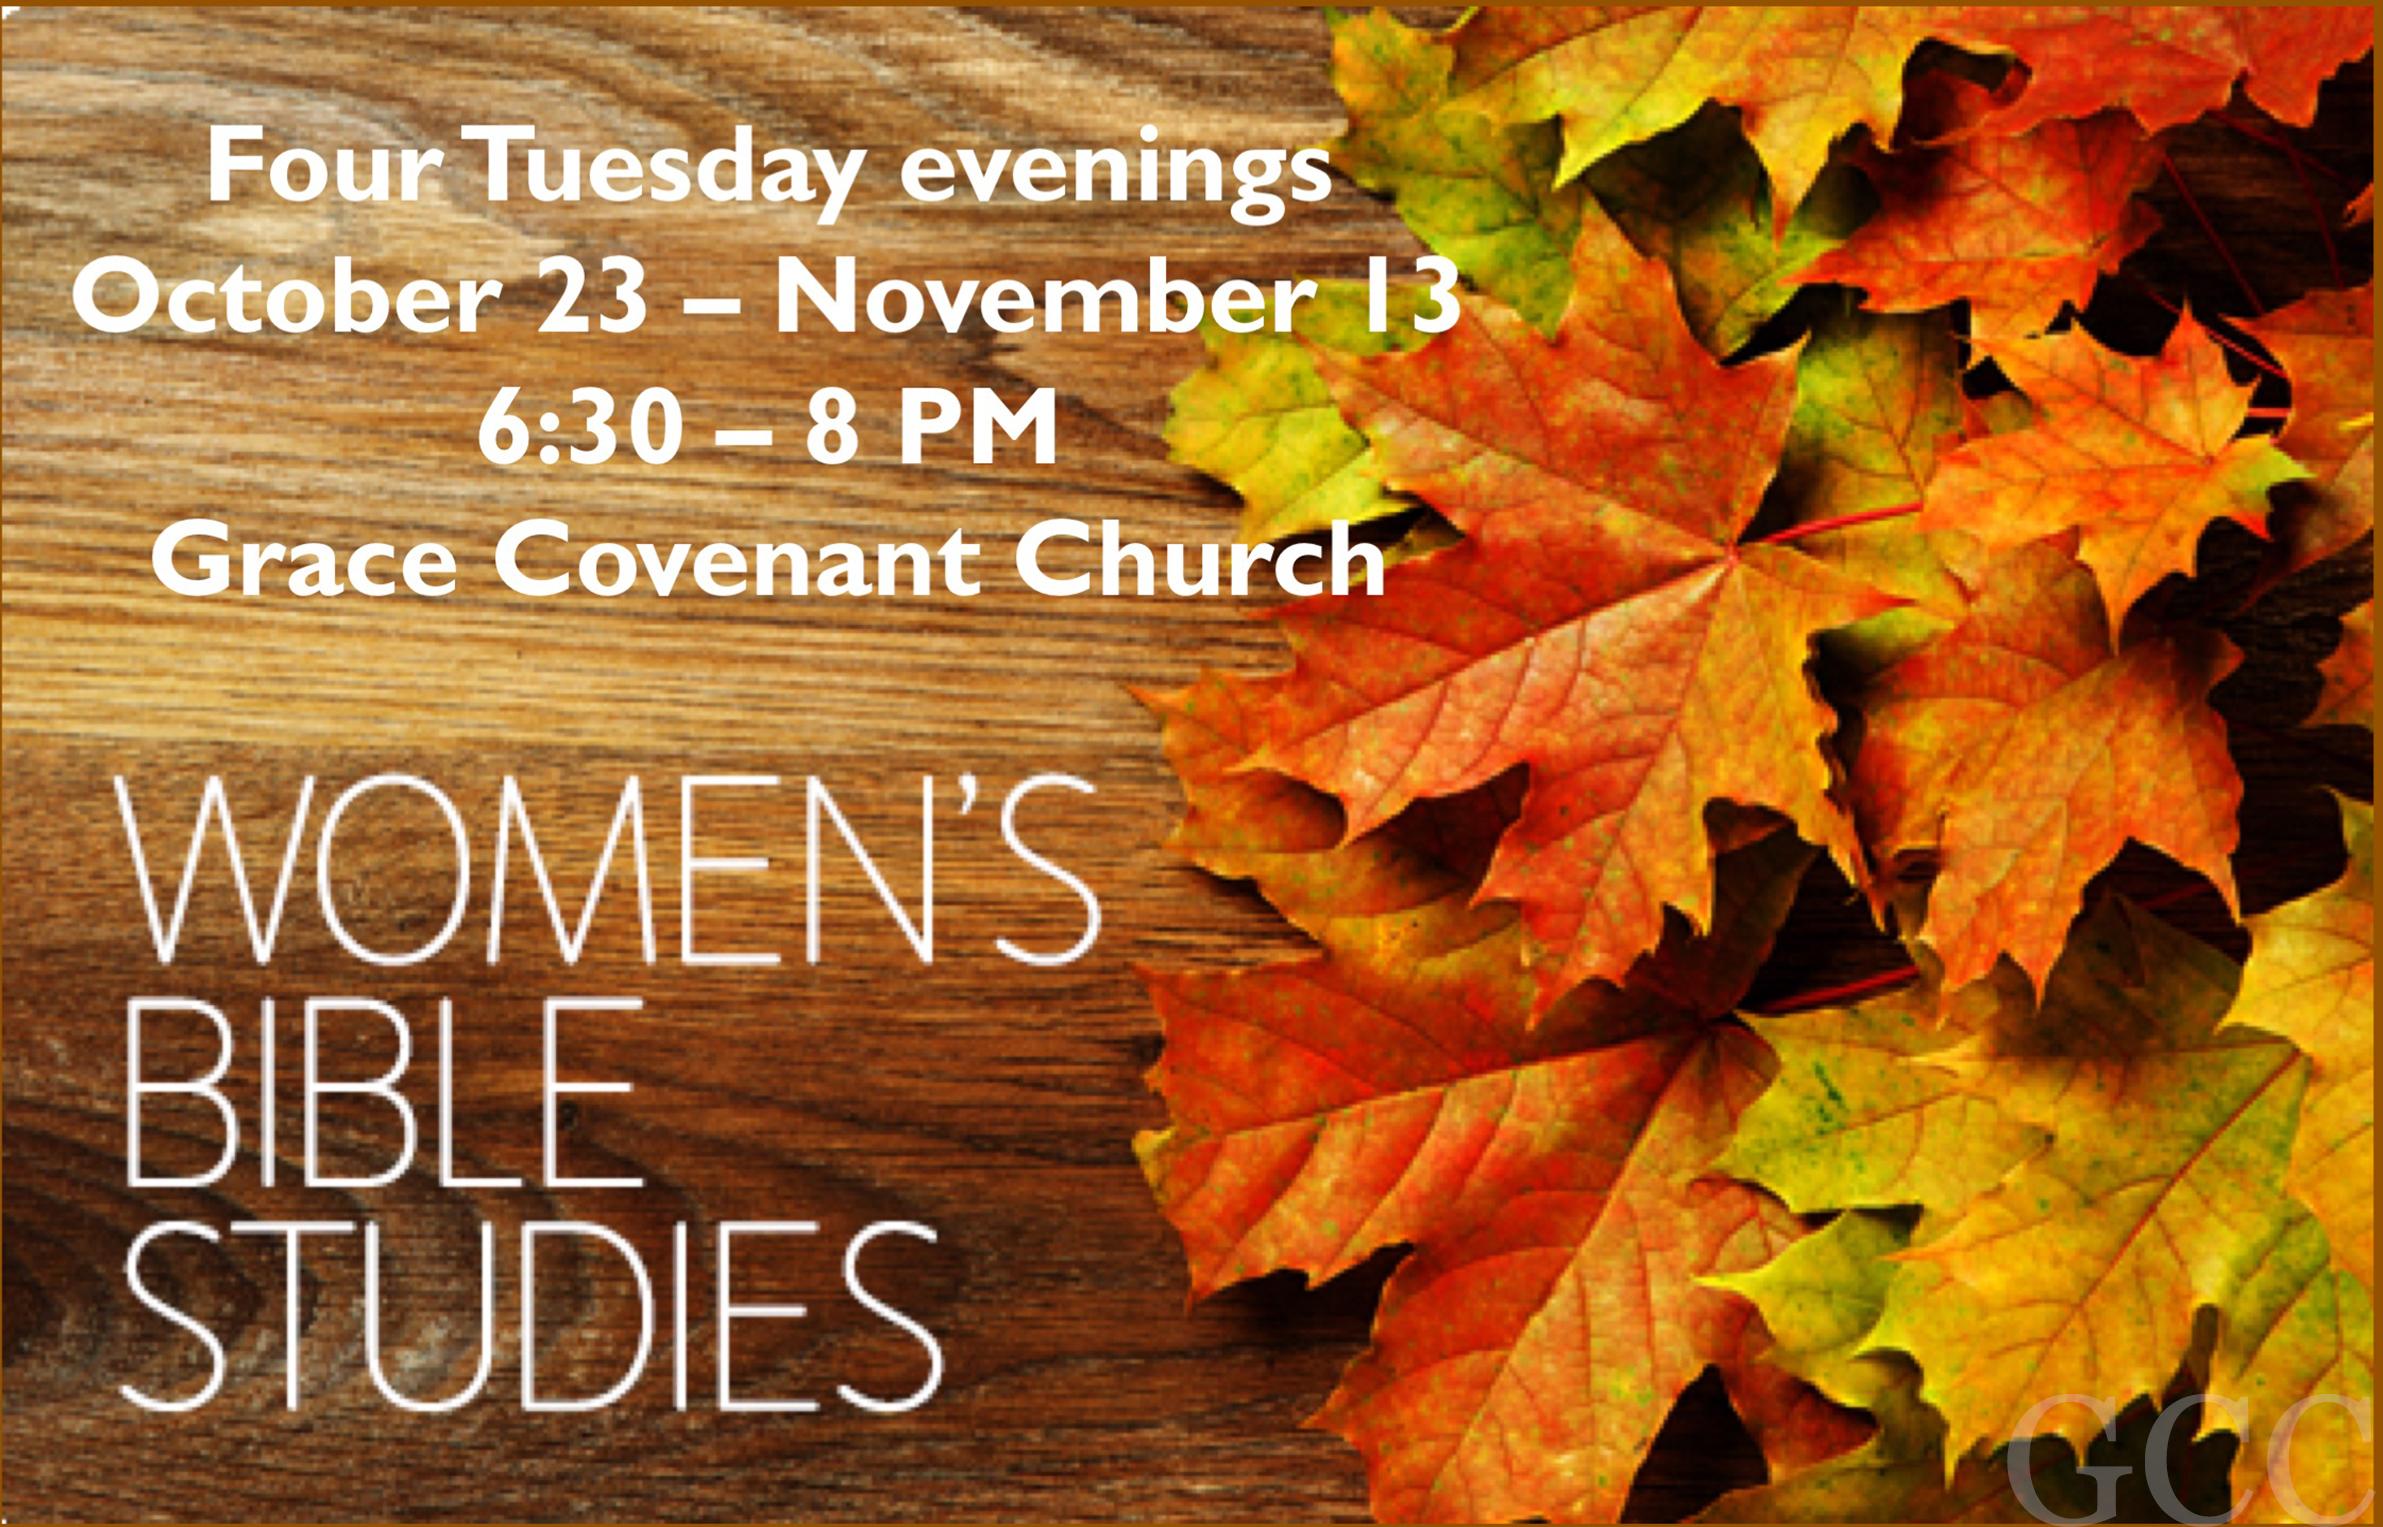 Women's Bible study copy image